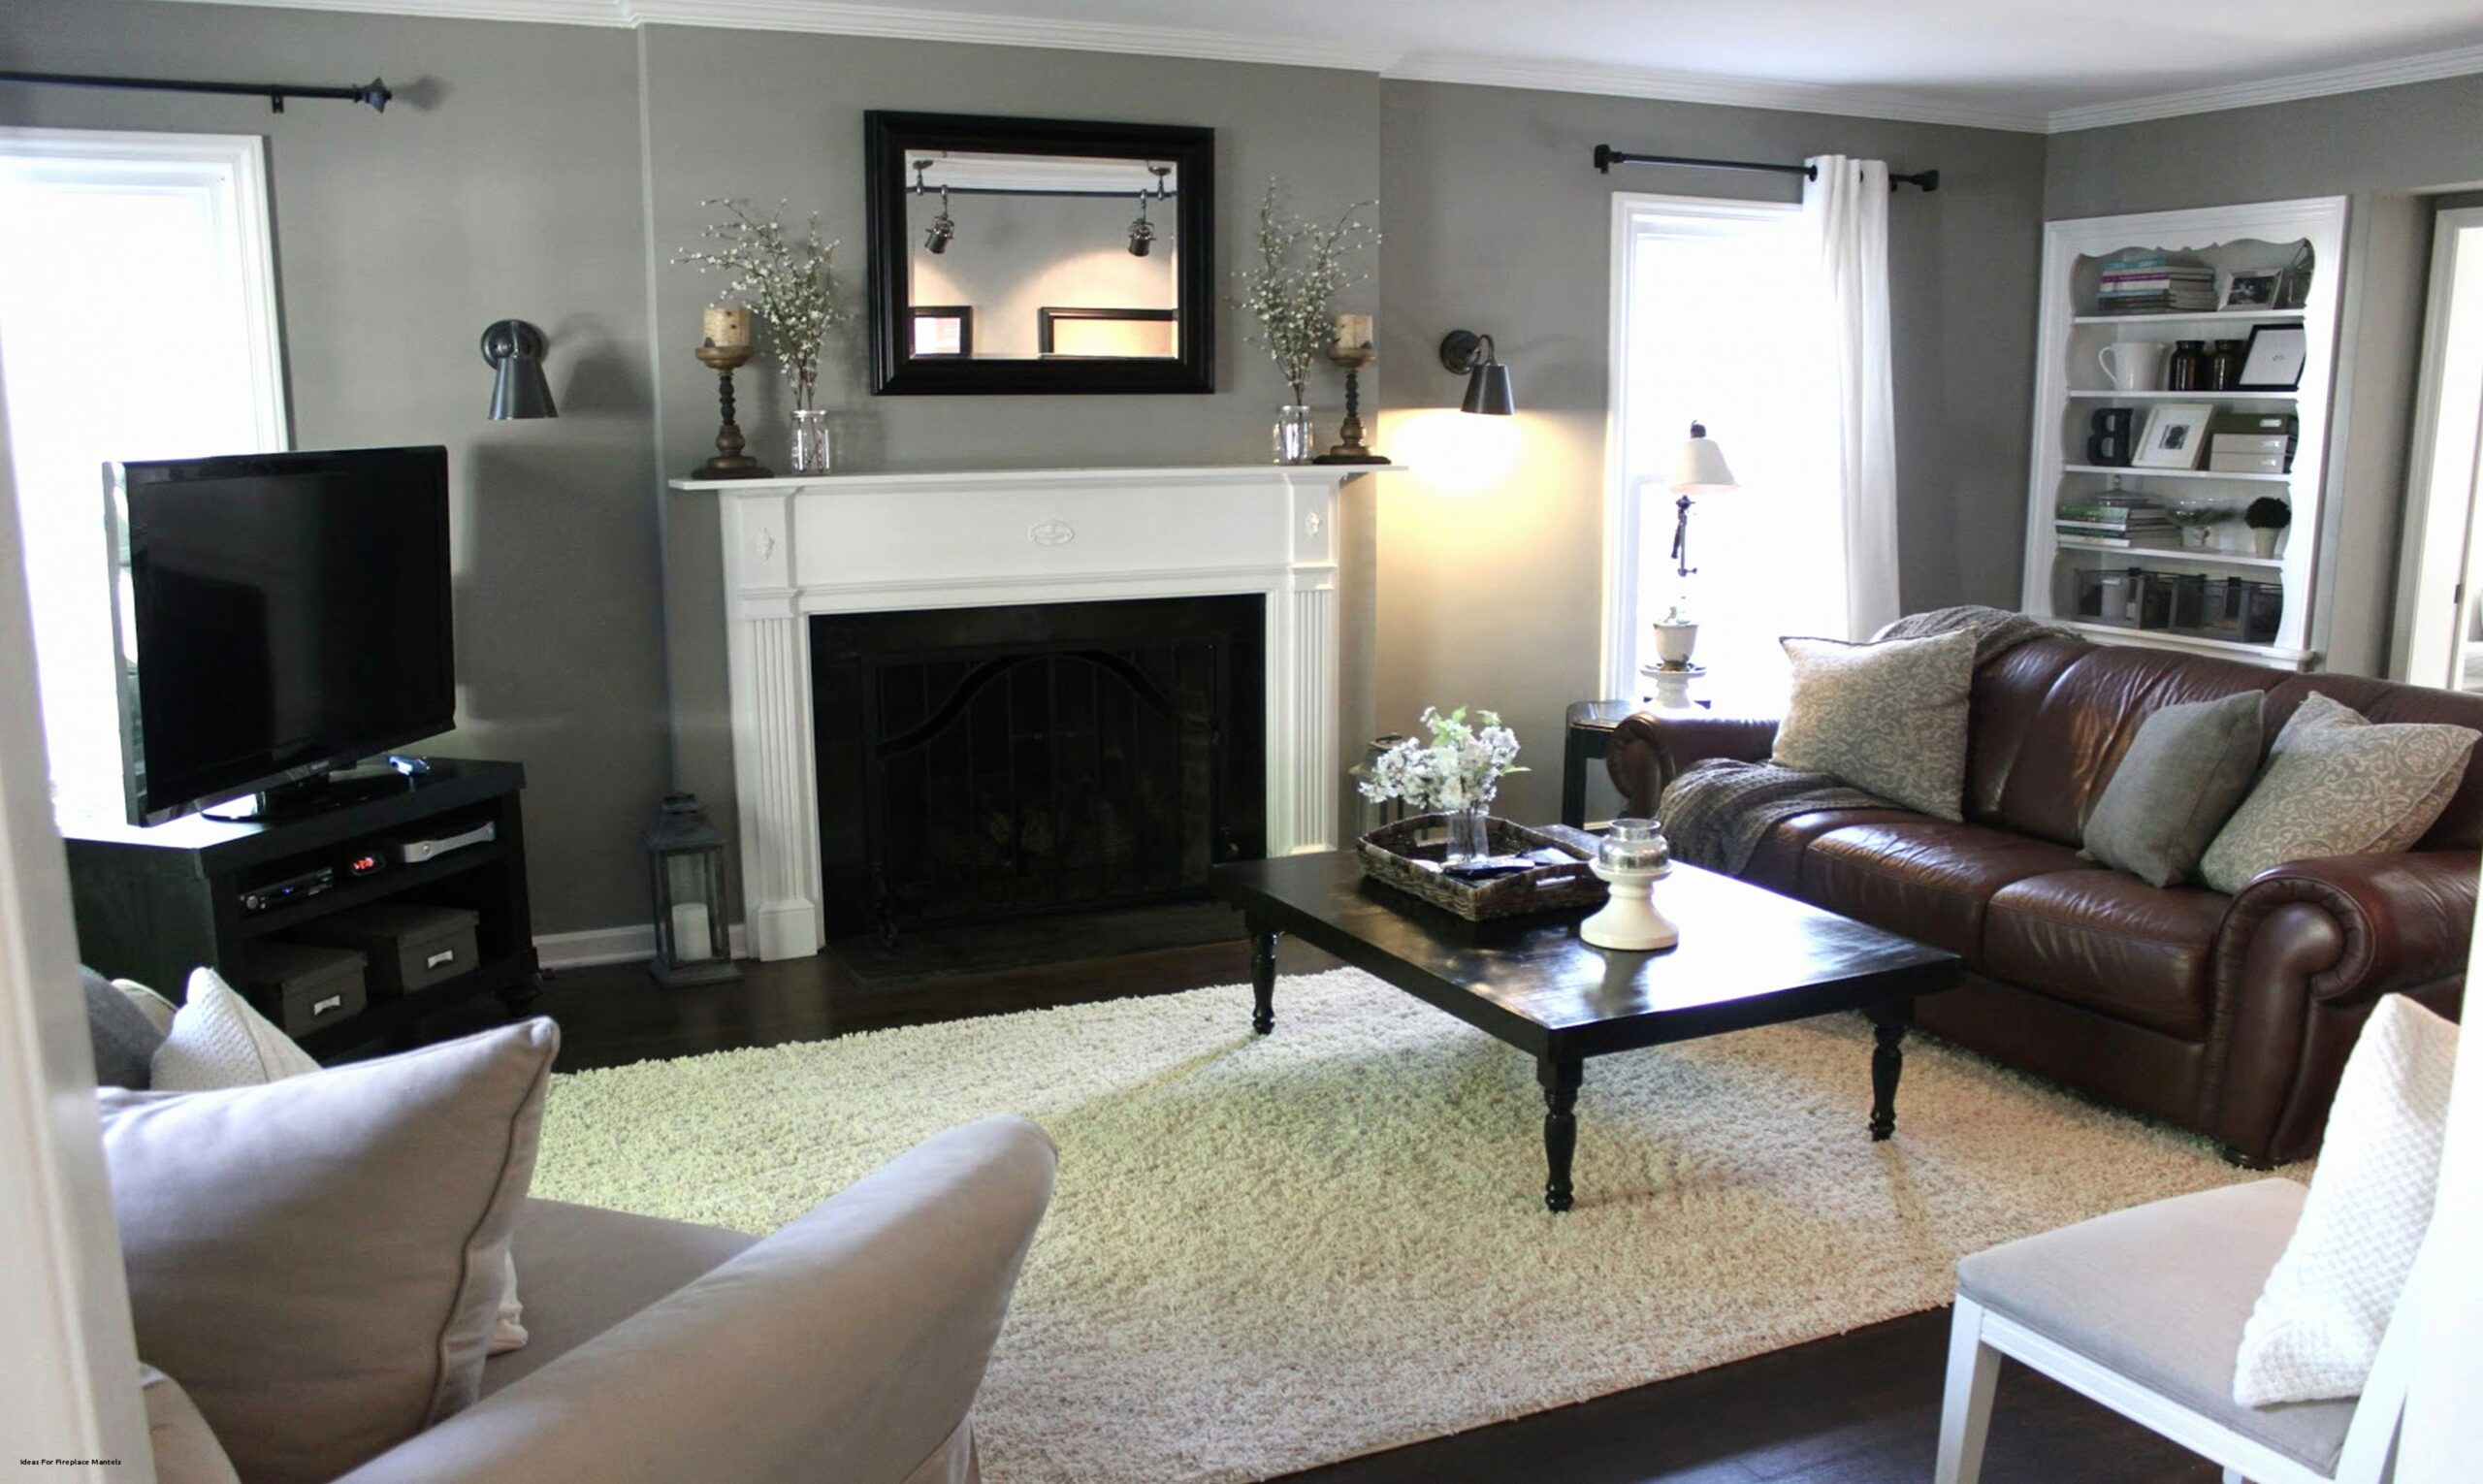 fireplace mantel shelf fireplace mantel decor elegant ideas for mantles albertville of fireplace mantel shelf scaled